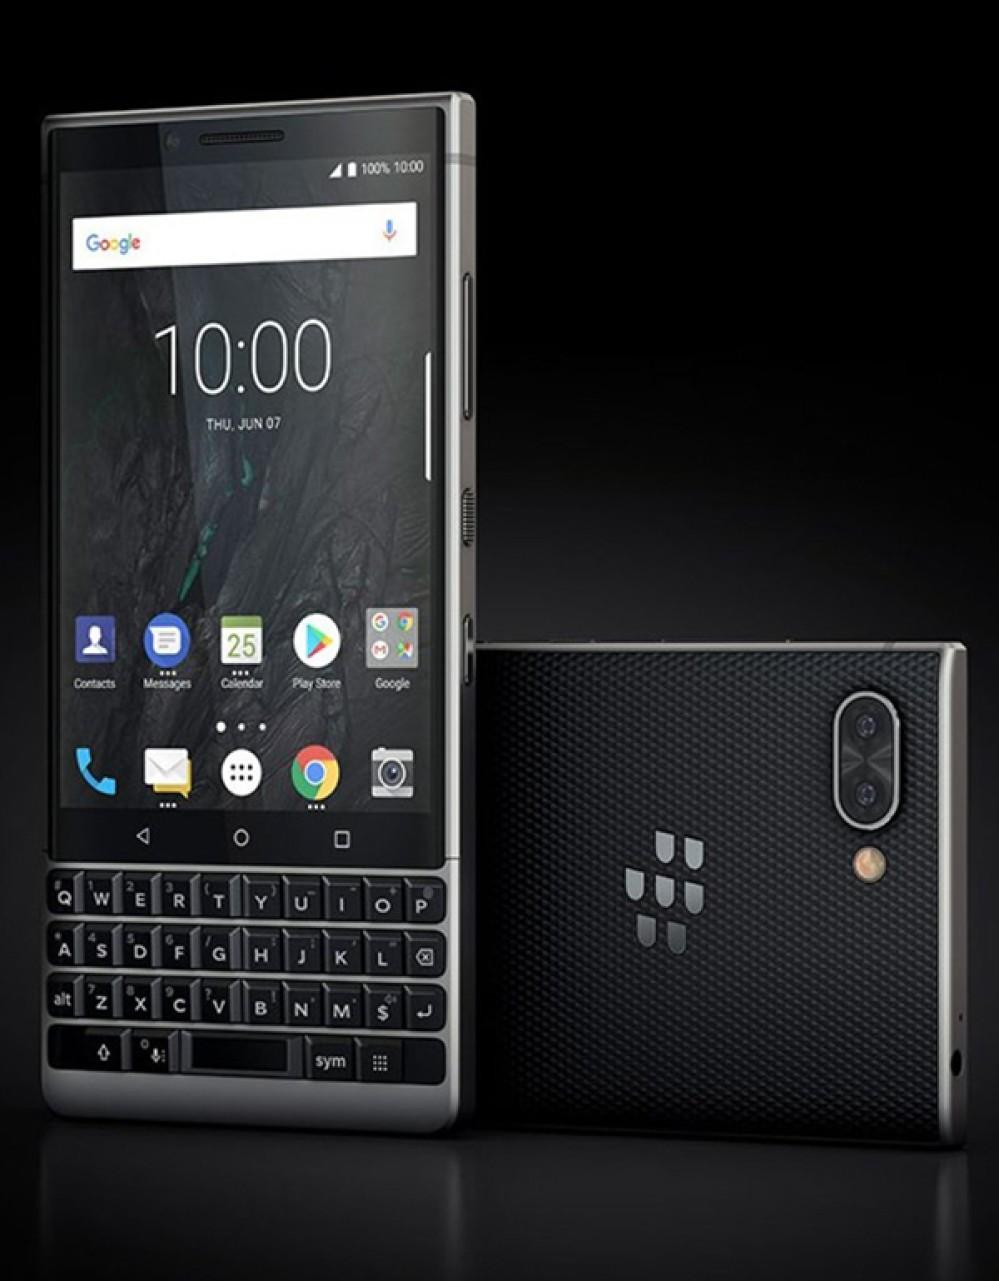 BlackBerry Key2: Αποκαλύφθηκε η πανέμορφη εμφάνιση και τα τεχνικά χαρακτηριστικά του [Pics]